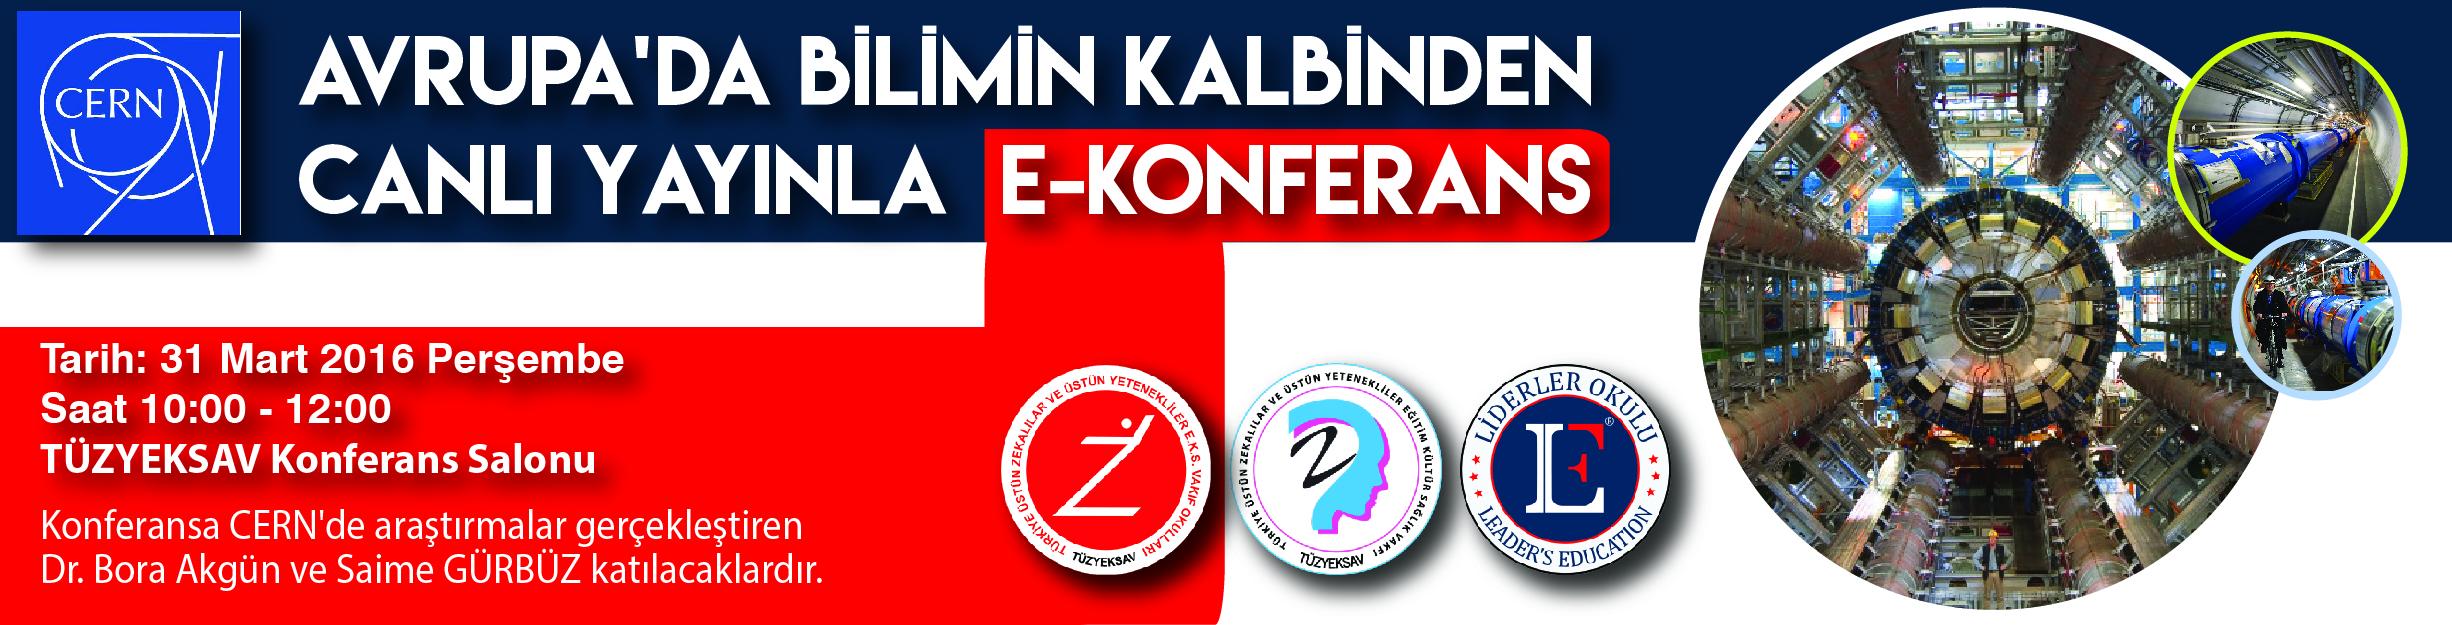 Cern-e-konferans-banner-01-01